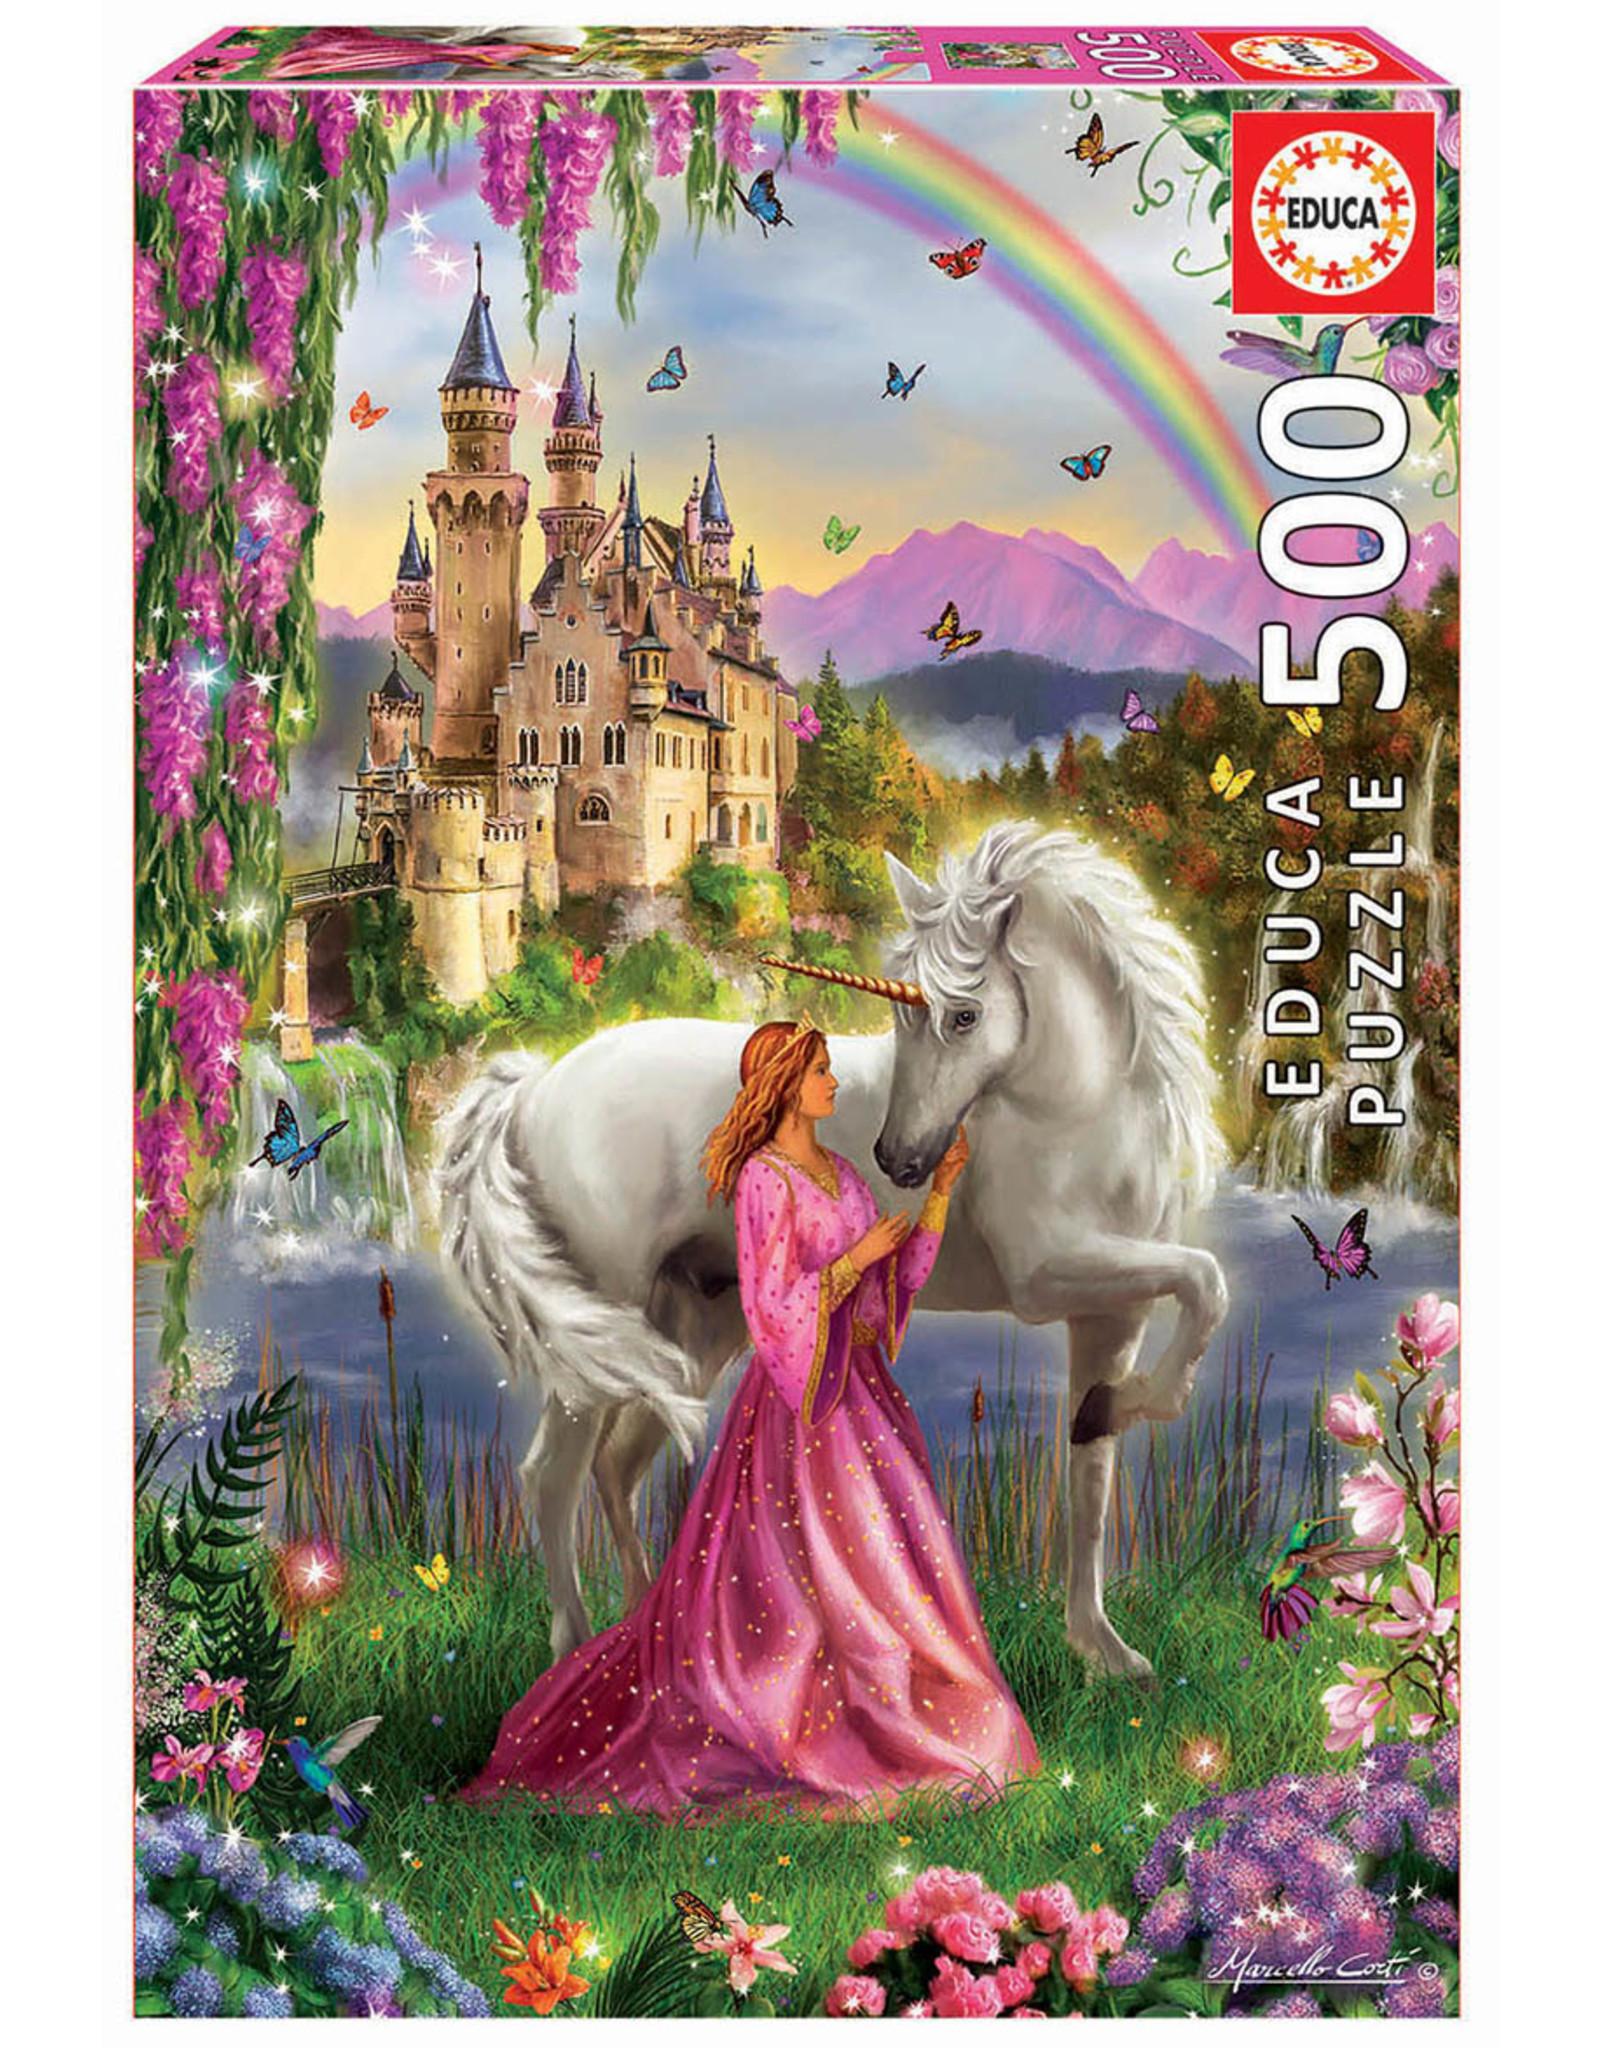 Educa Fairy and Unicorn - 500 Piece Puzzle